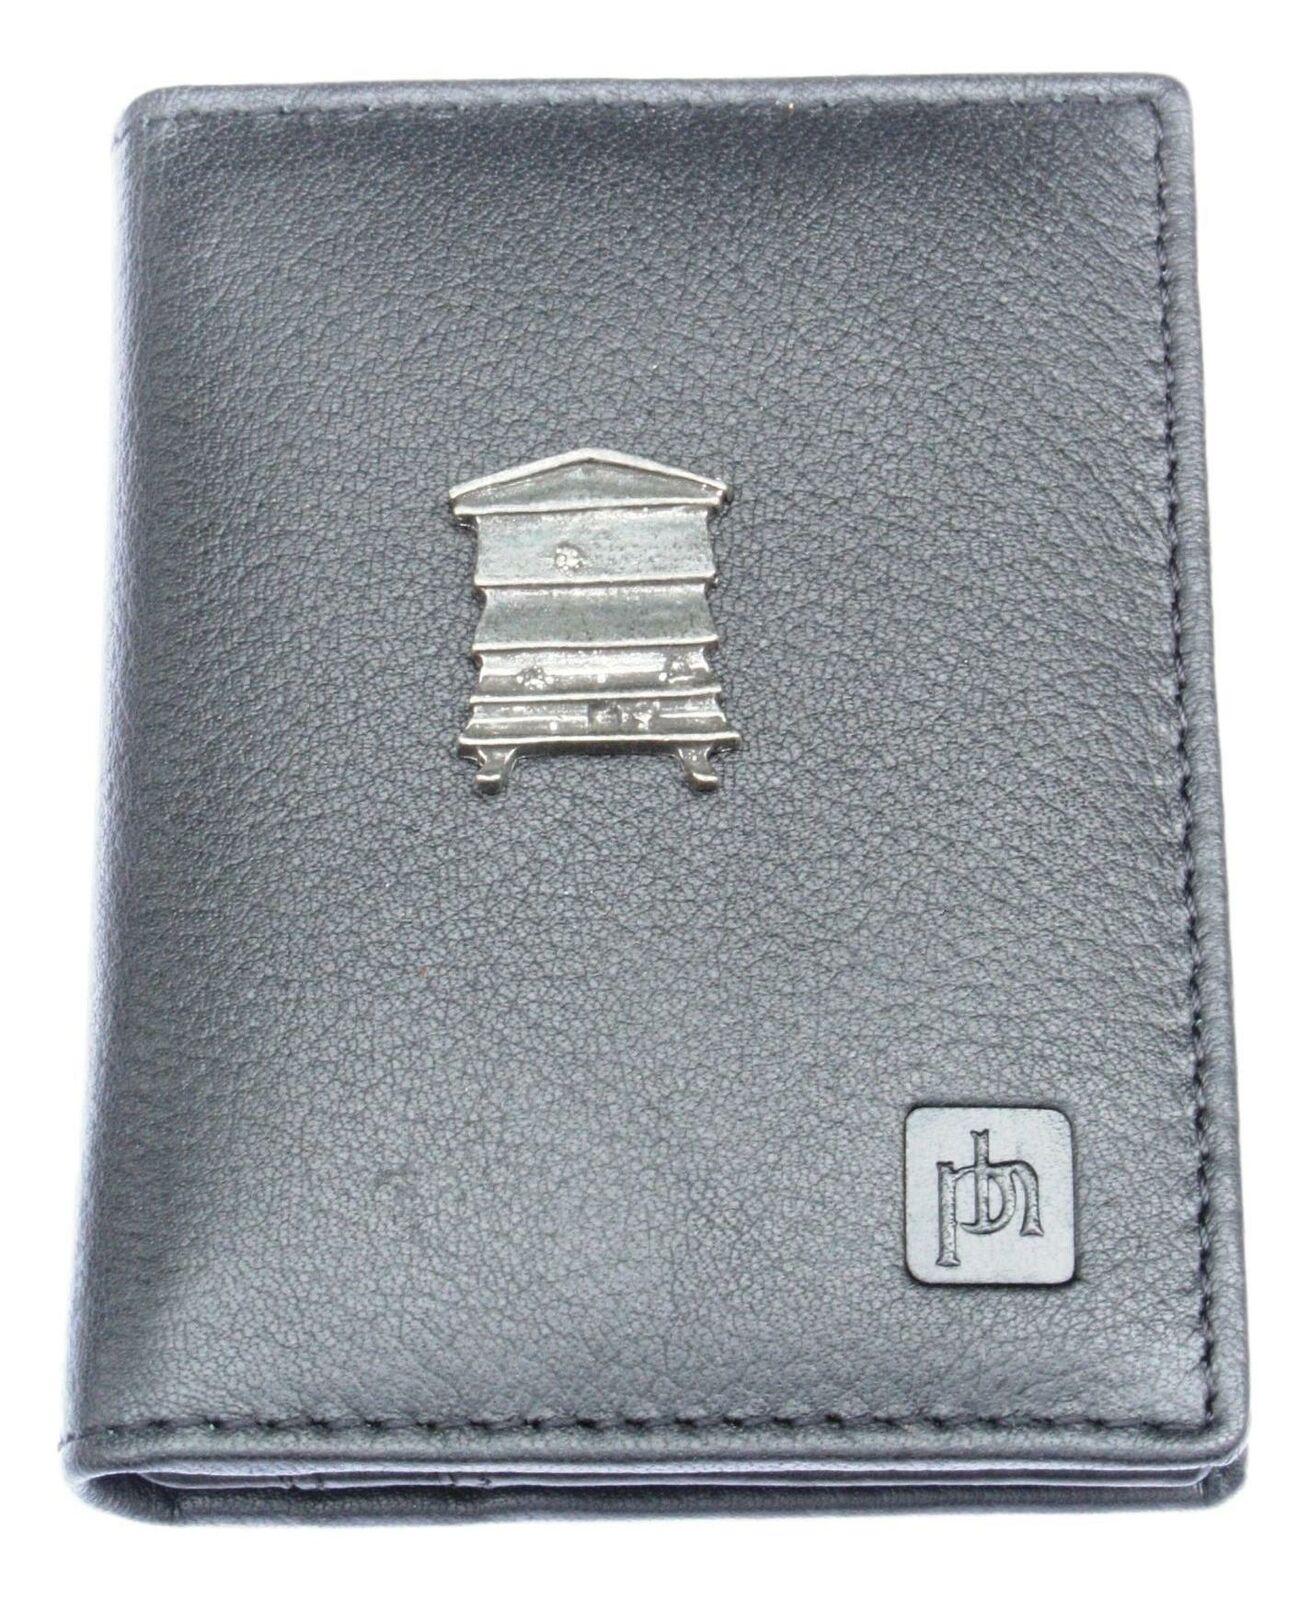 Bee Hive Bifold Card Holder Leather Black Wallet RFID Safe 29